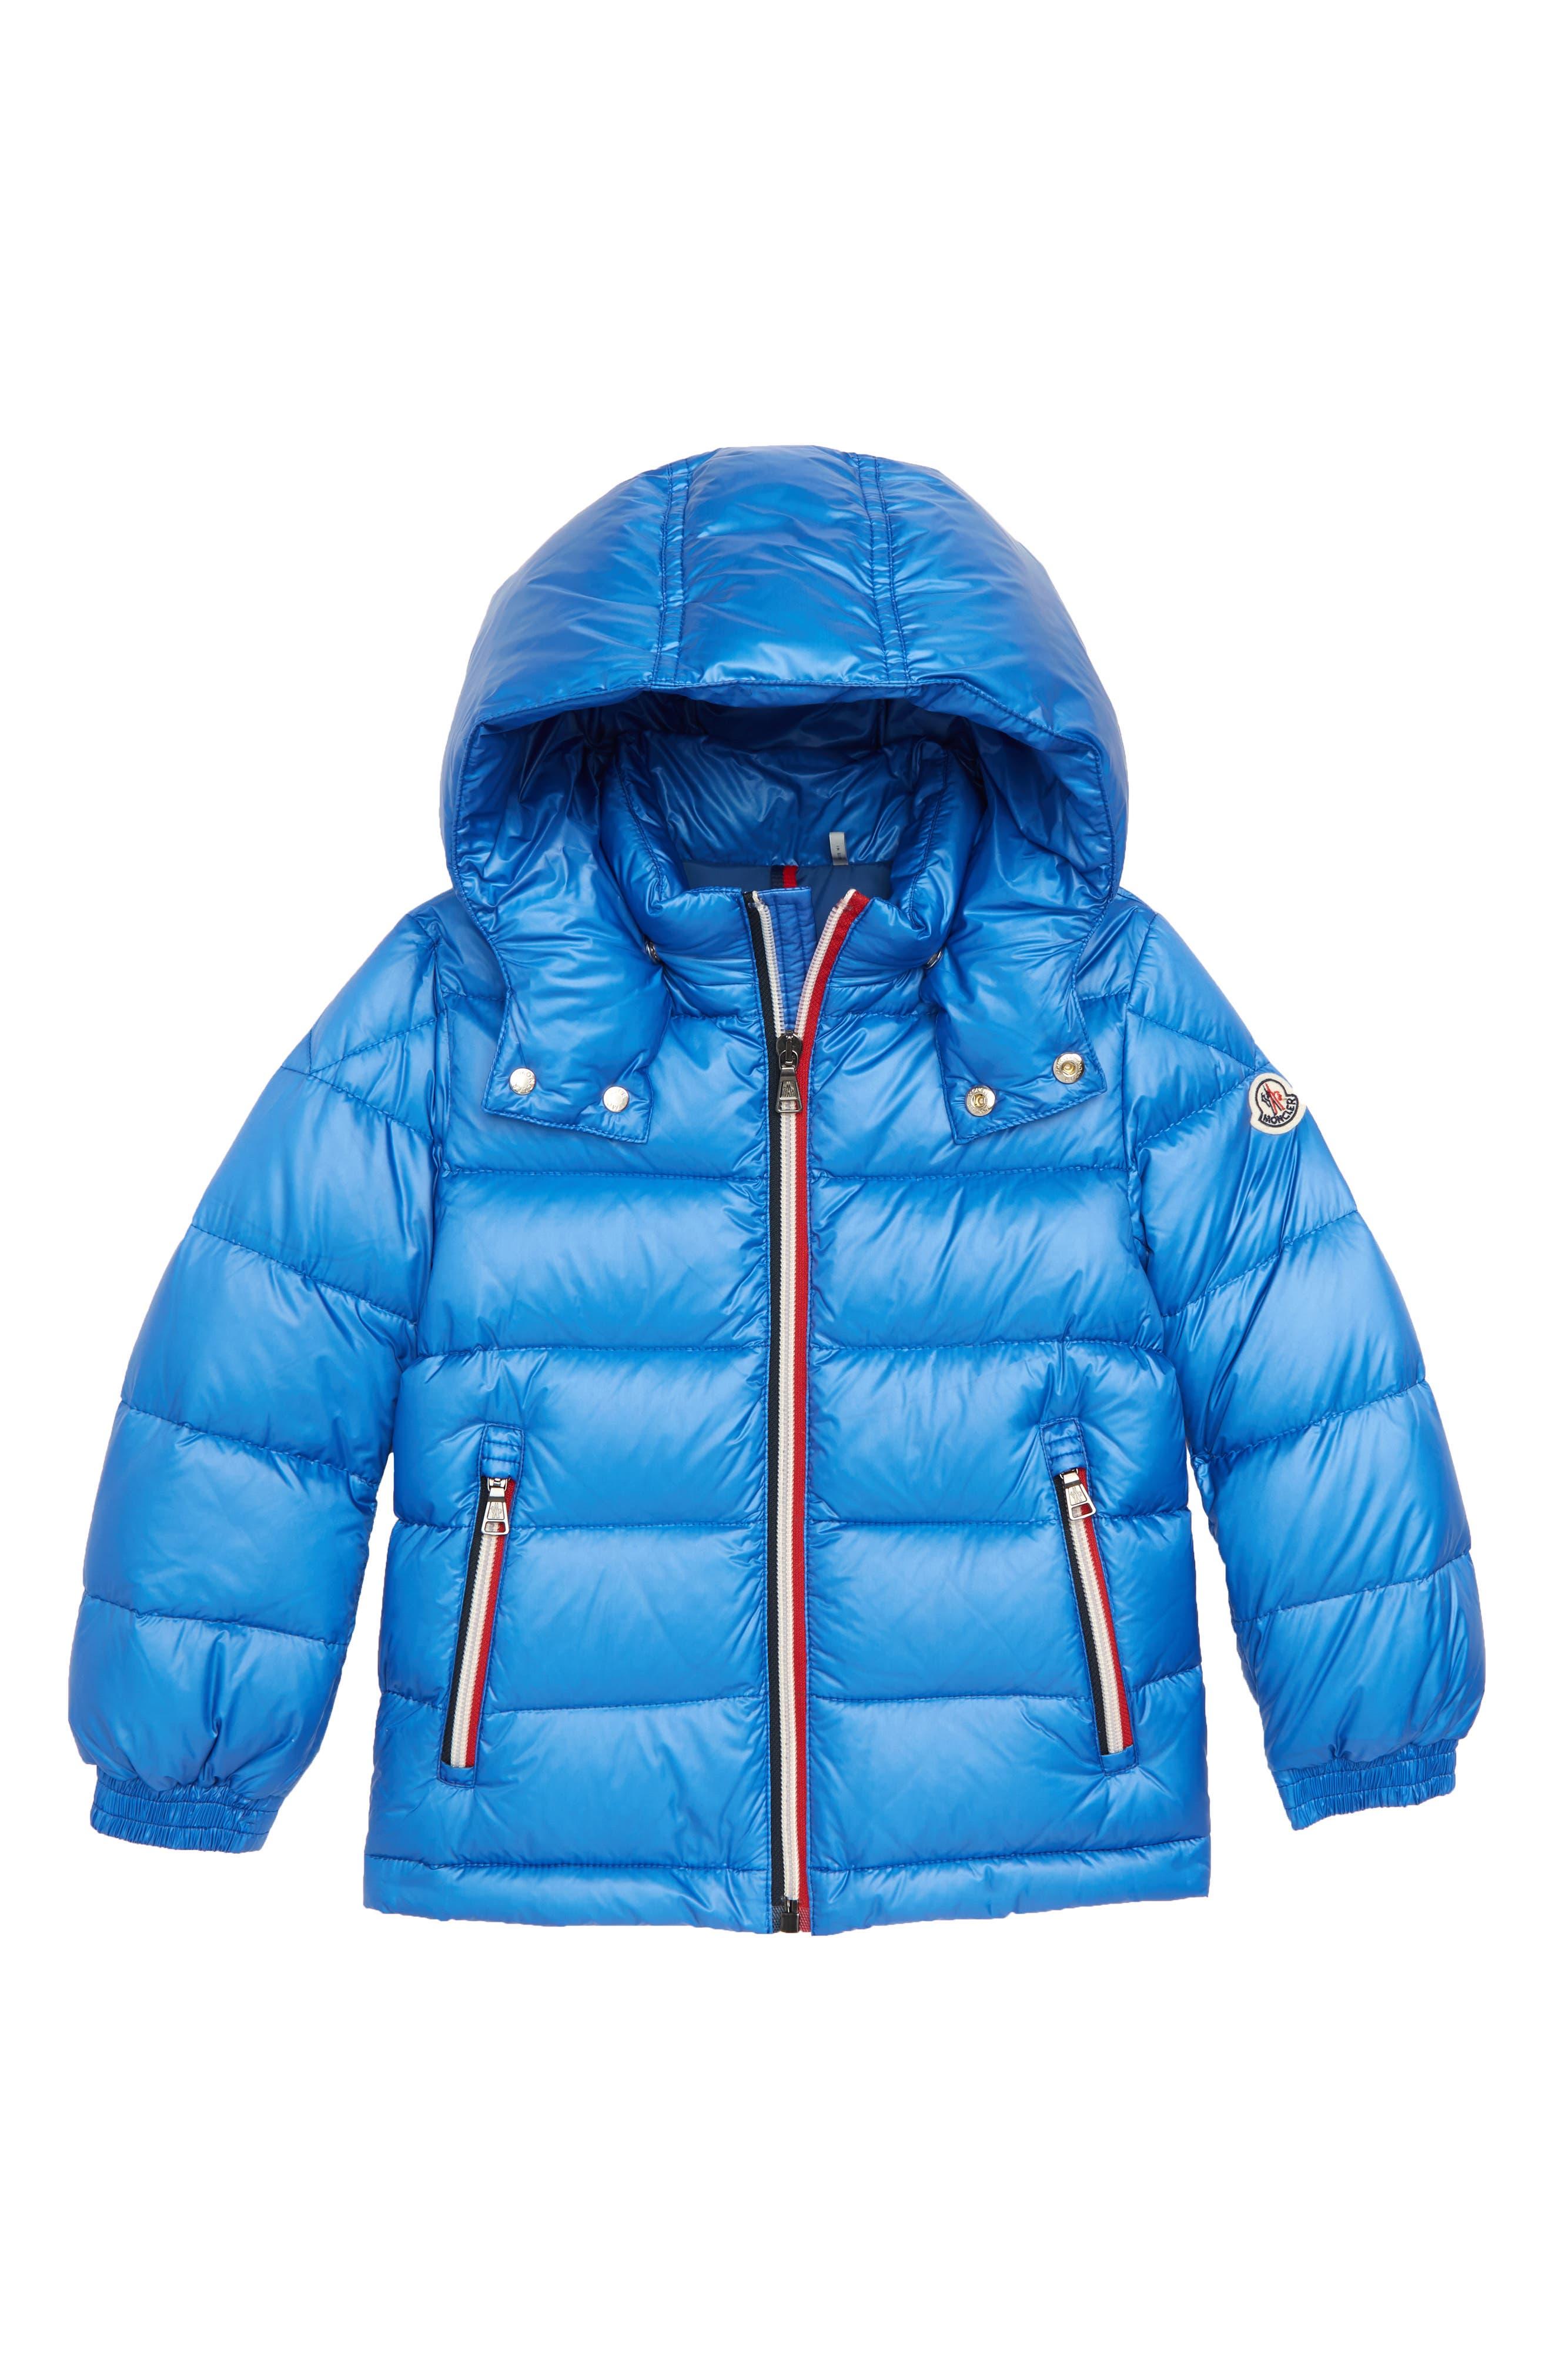 Moncler Gastonet Hooded Water Resistant Down Jacket (Little Boys & Big Boys)